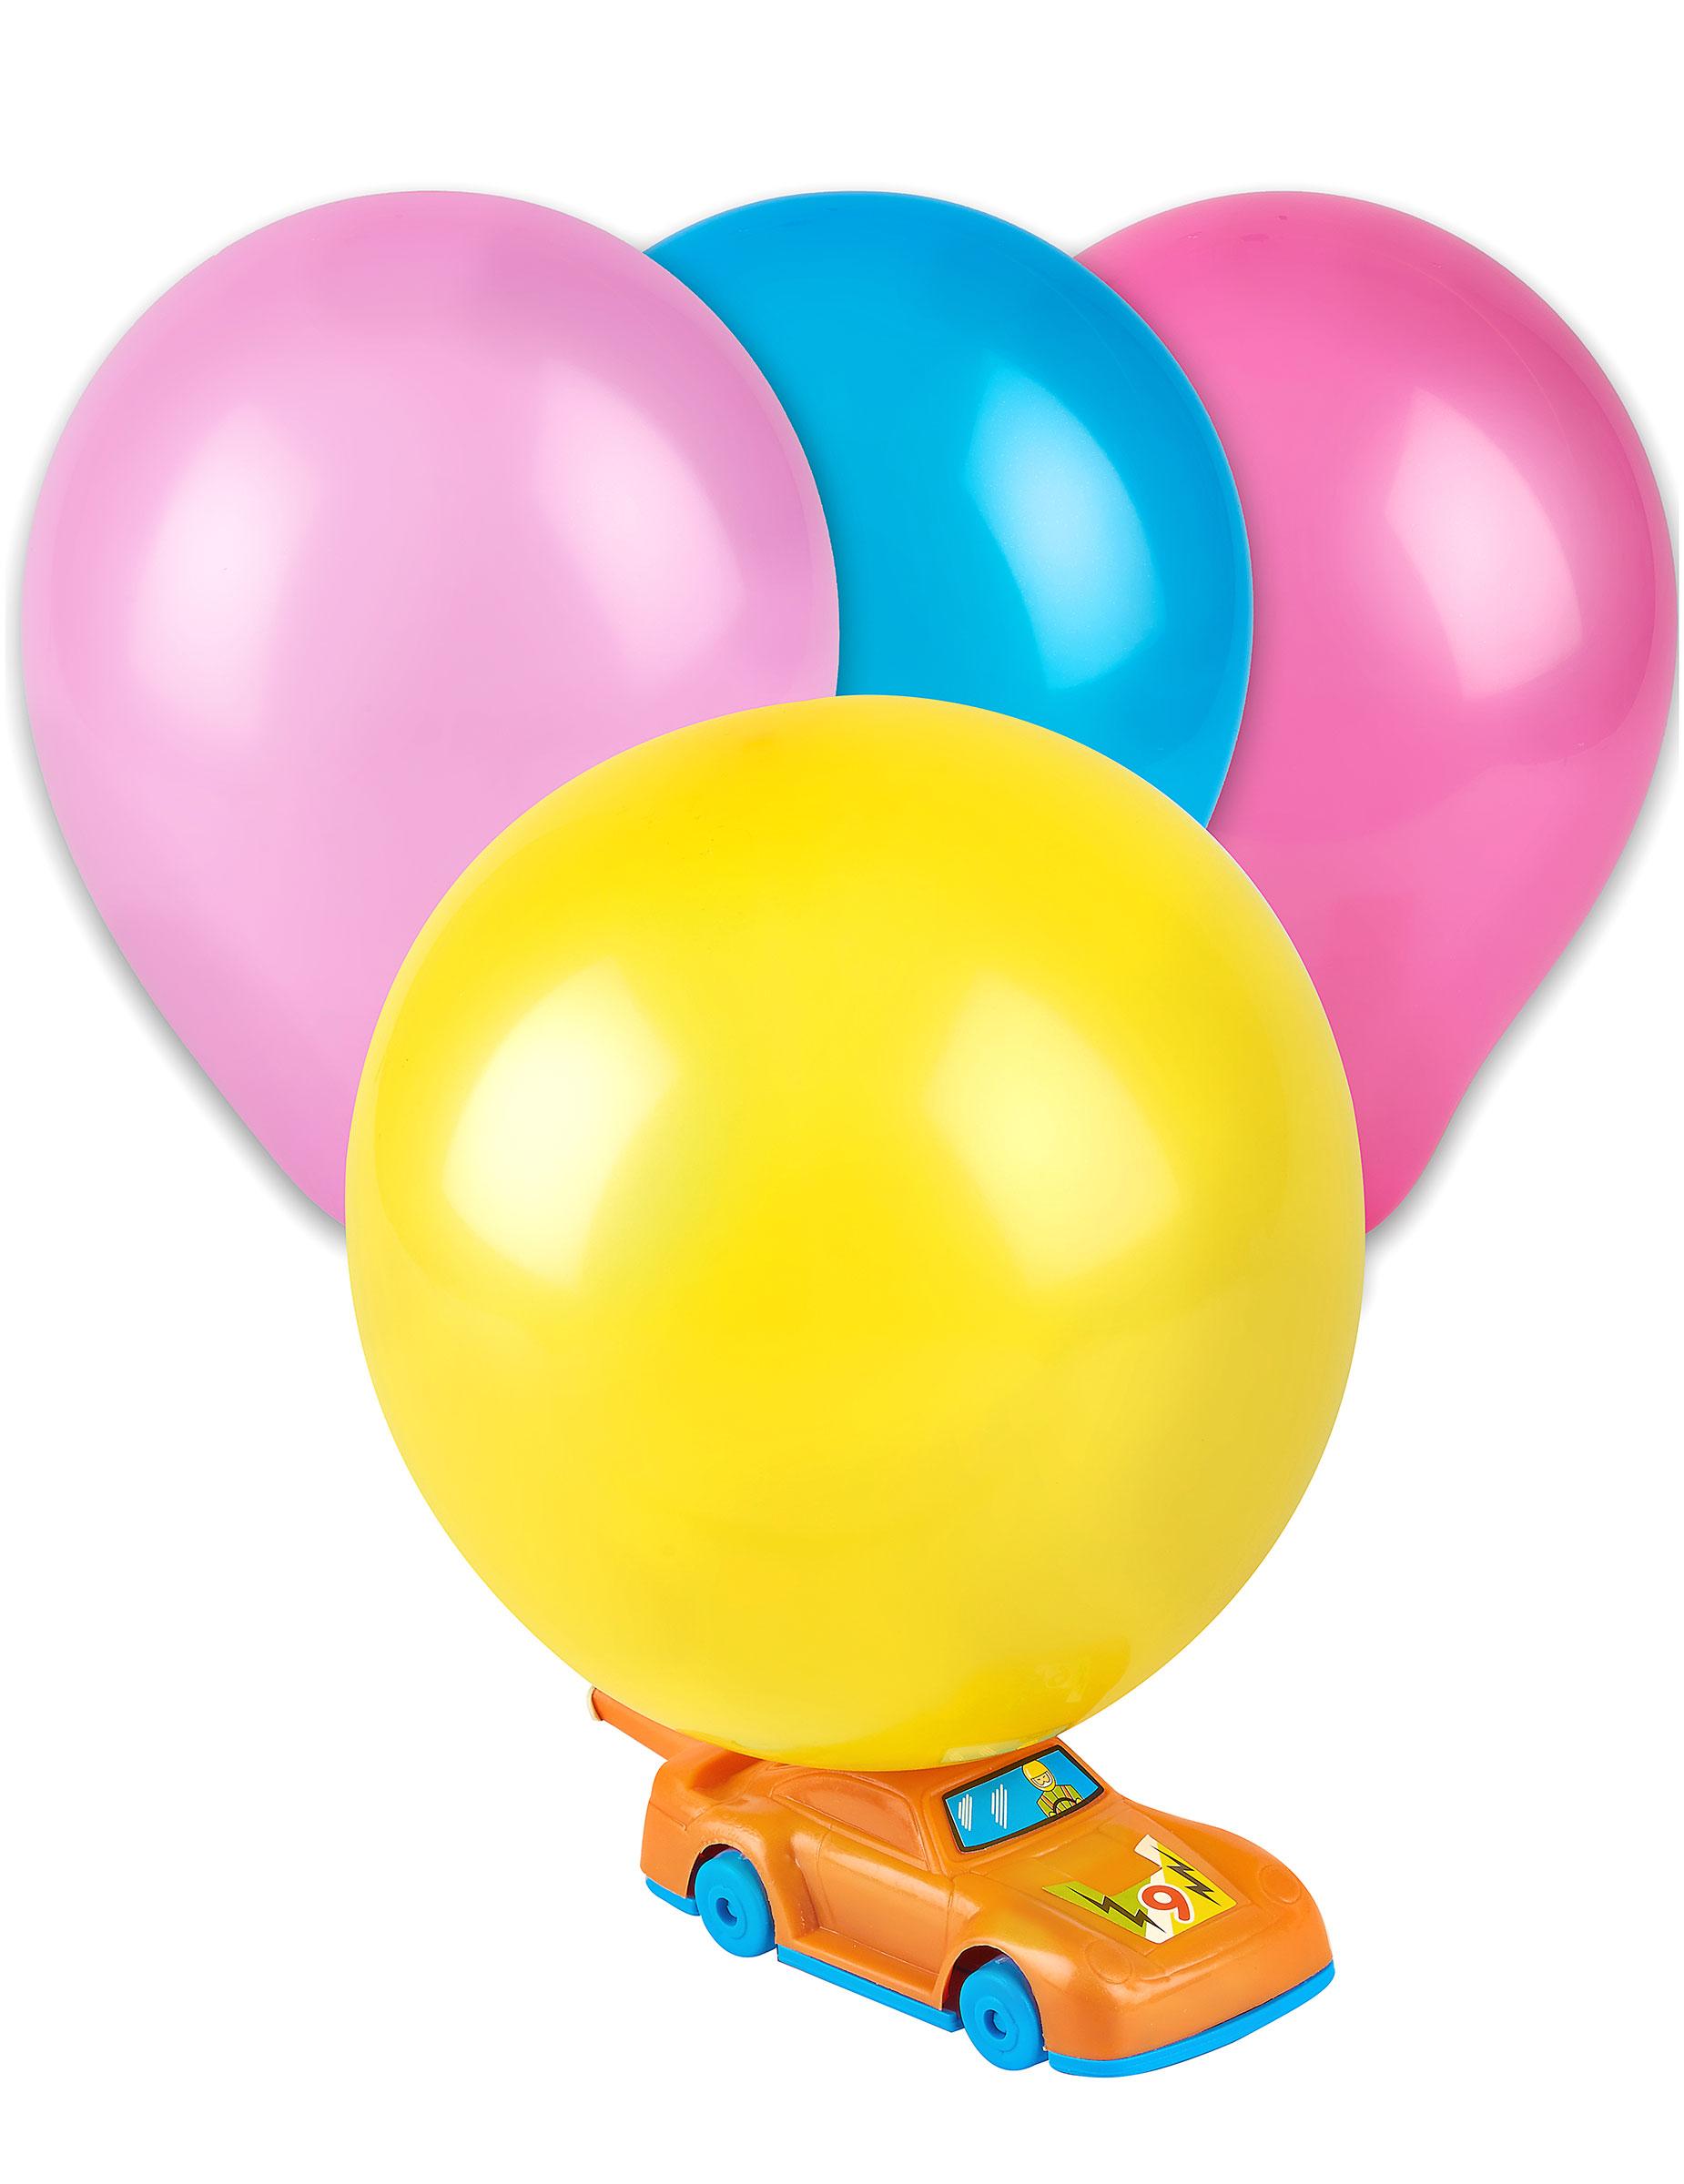 Party Spielzeug Auto mit Luftballons 6-teilig bunt